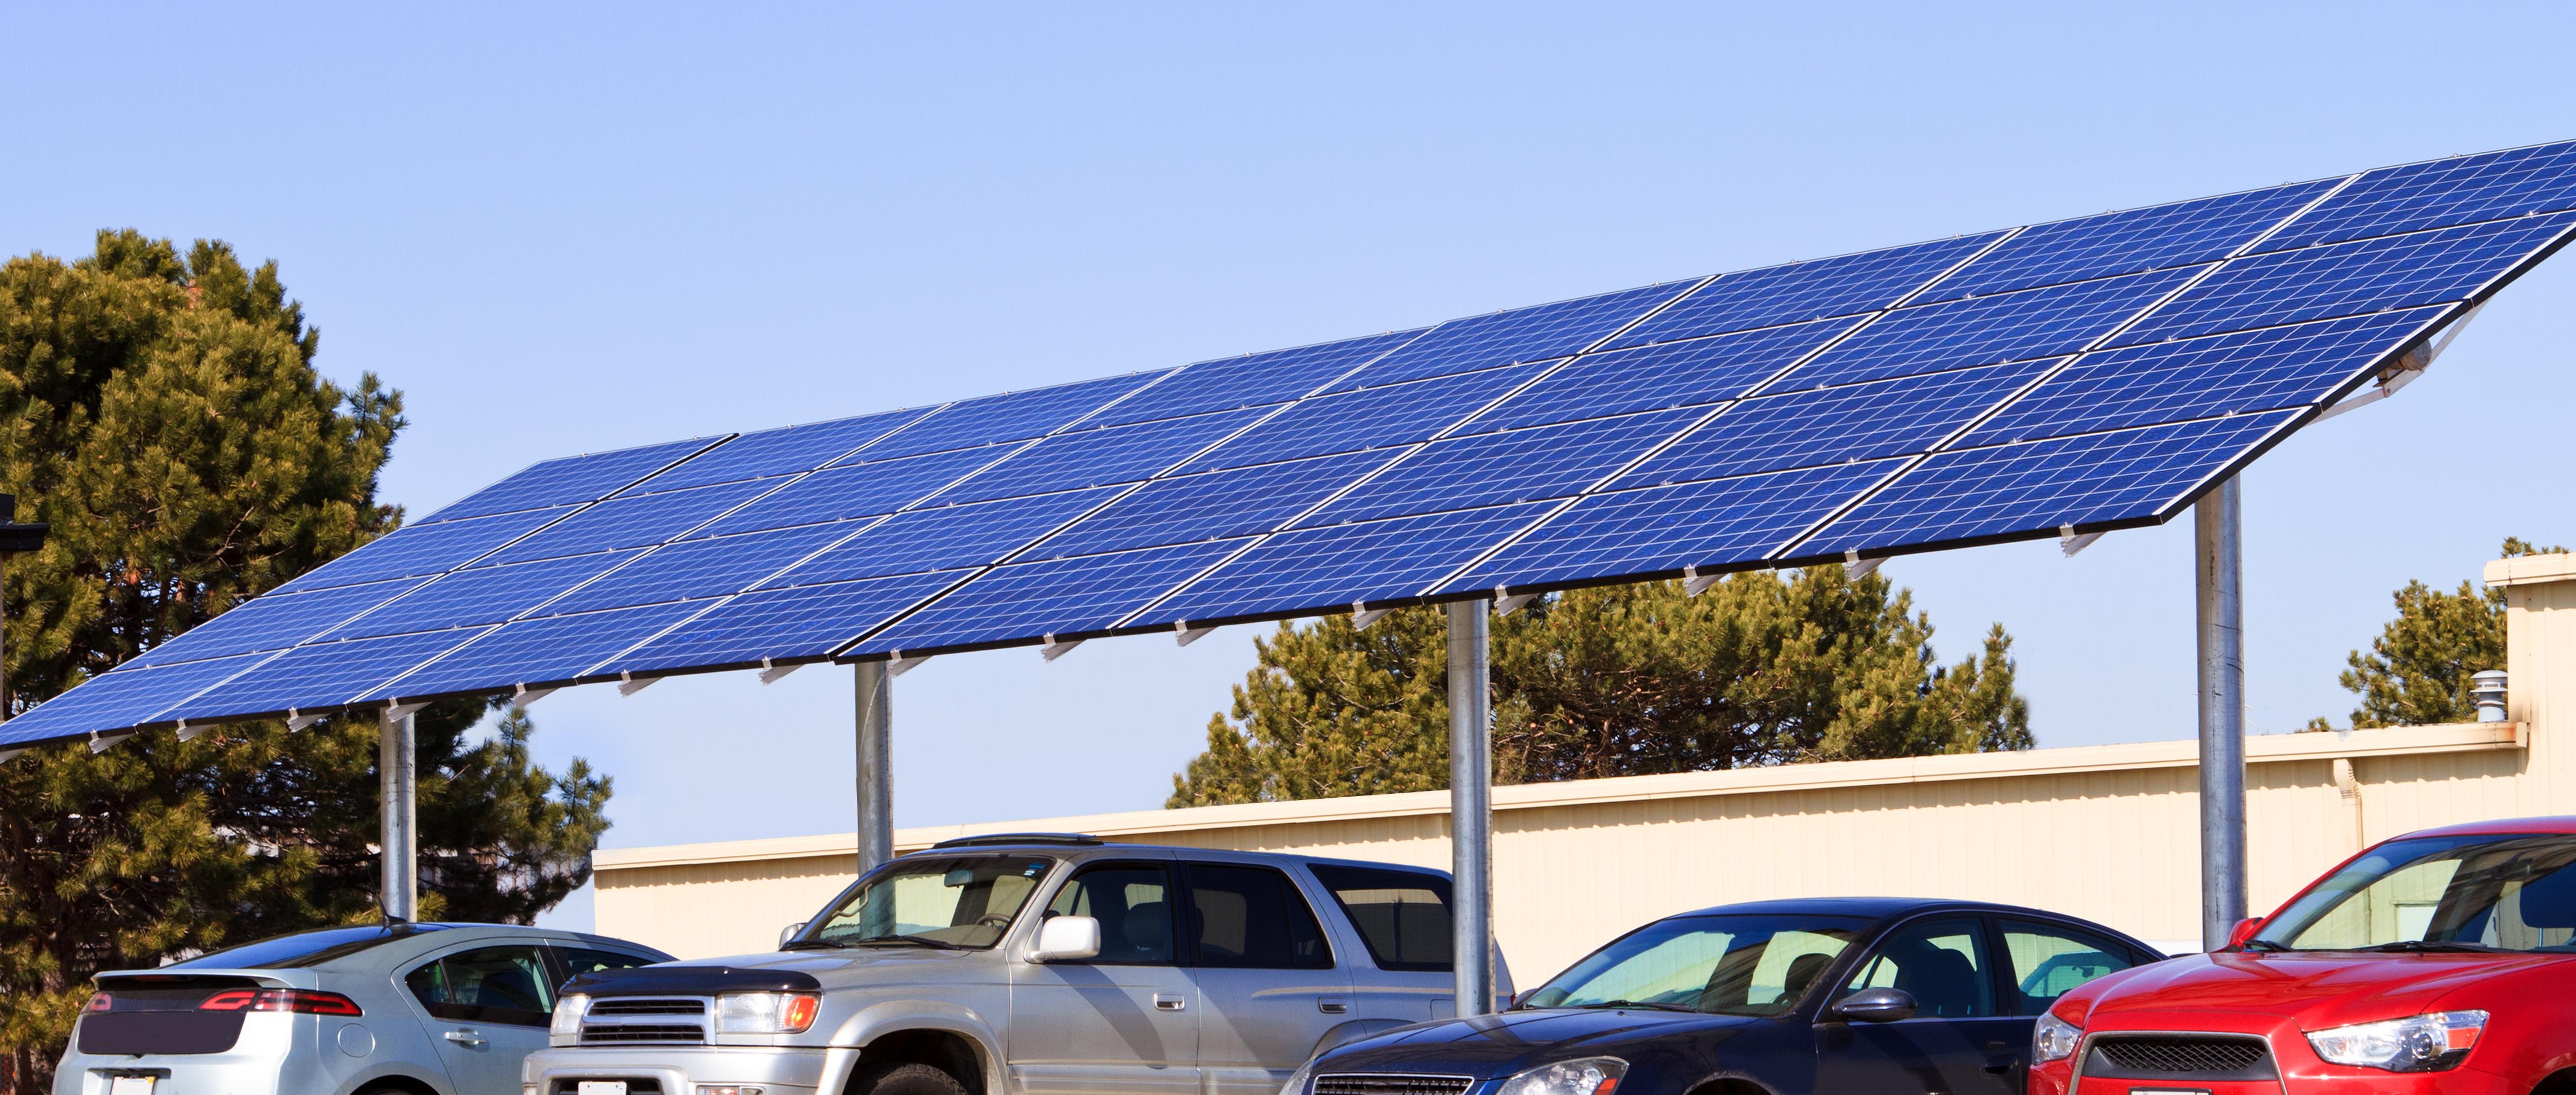 Minimal Space Solar Car Port